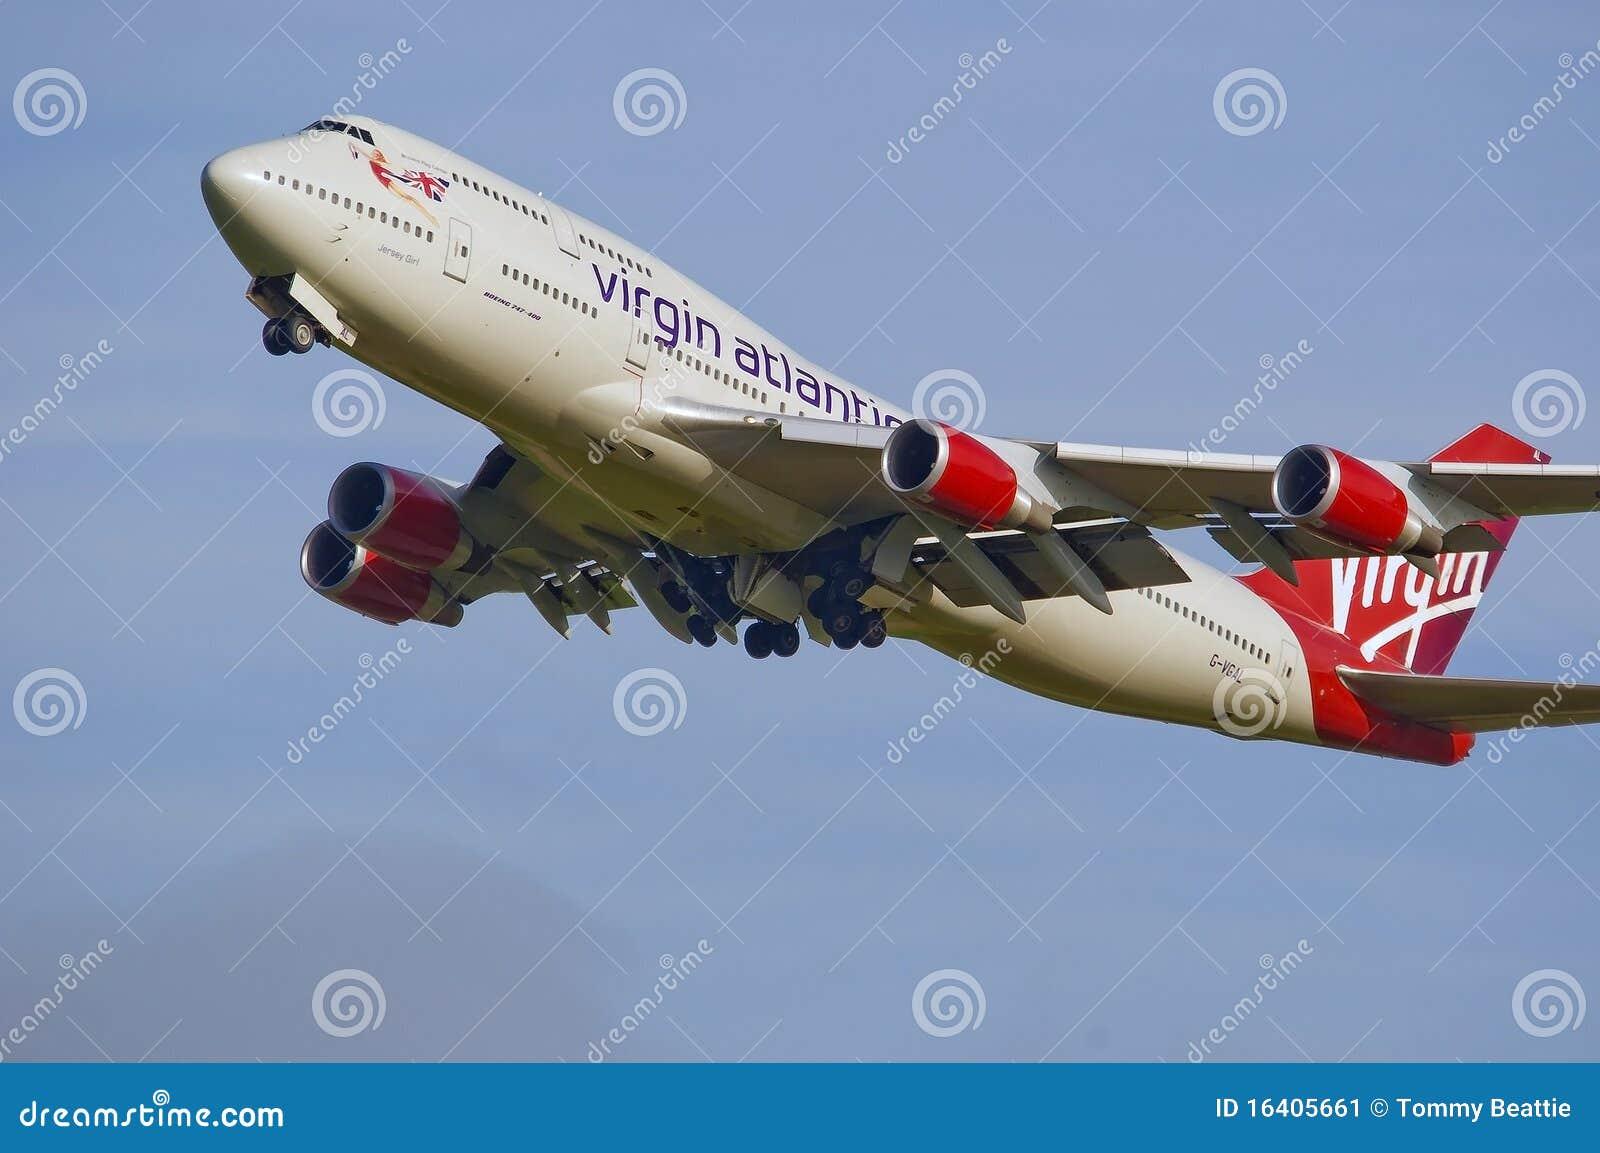 Virgin corporate strategy, Case Study